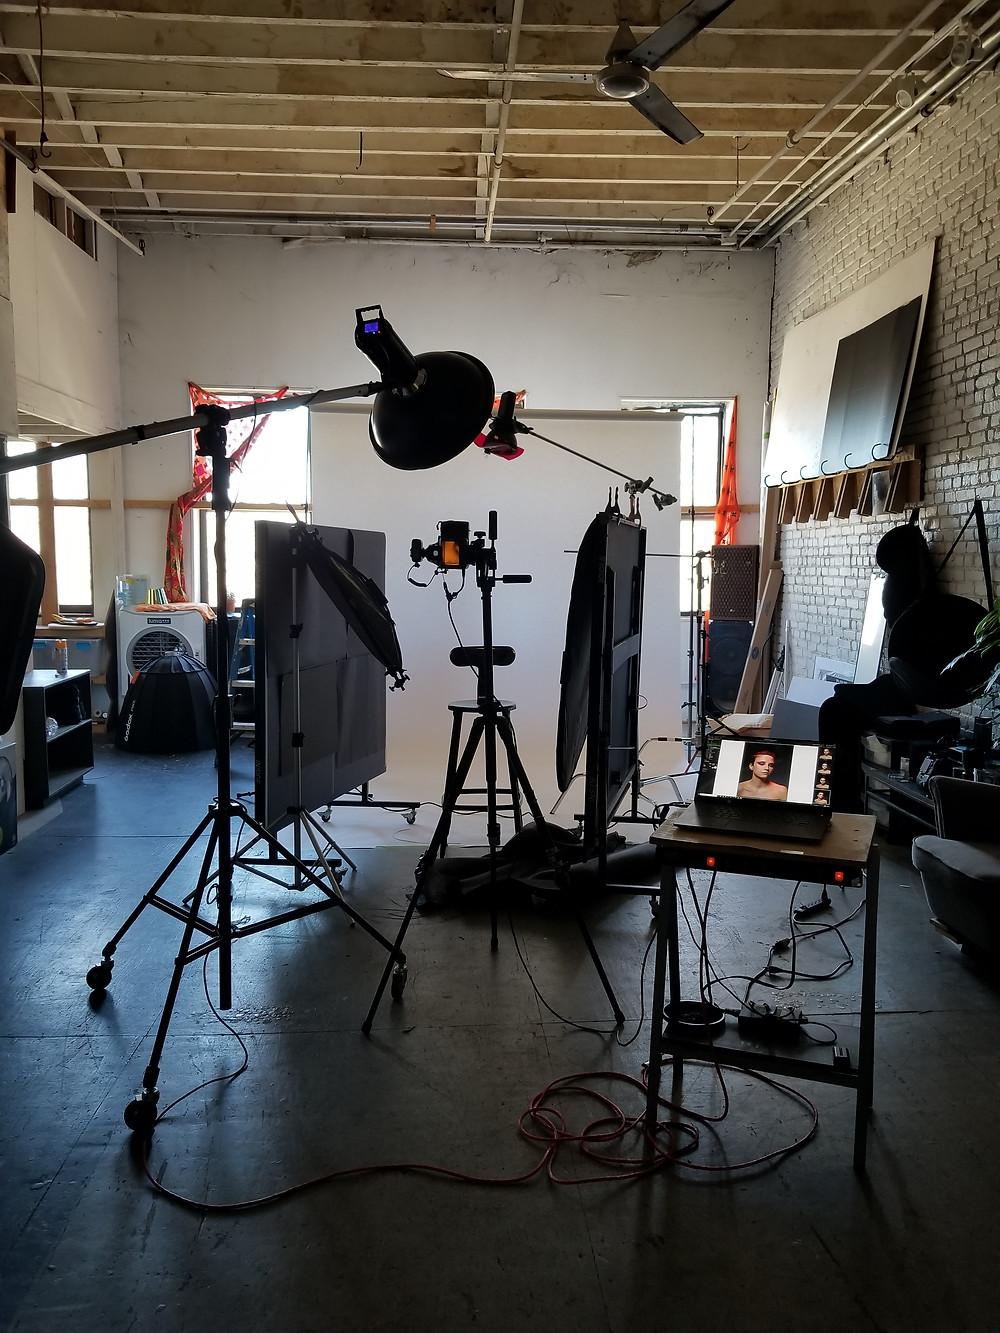 Studio almost fully set up in Brooklyn Navy Yard